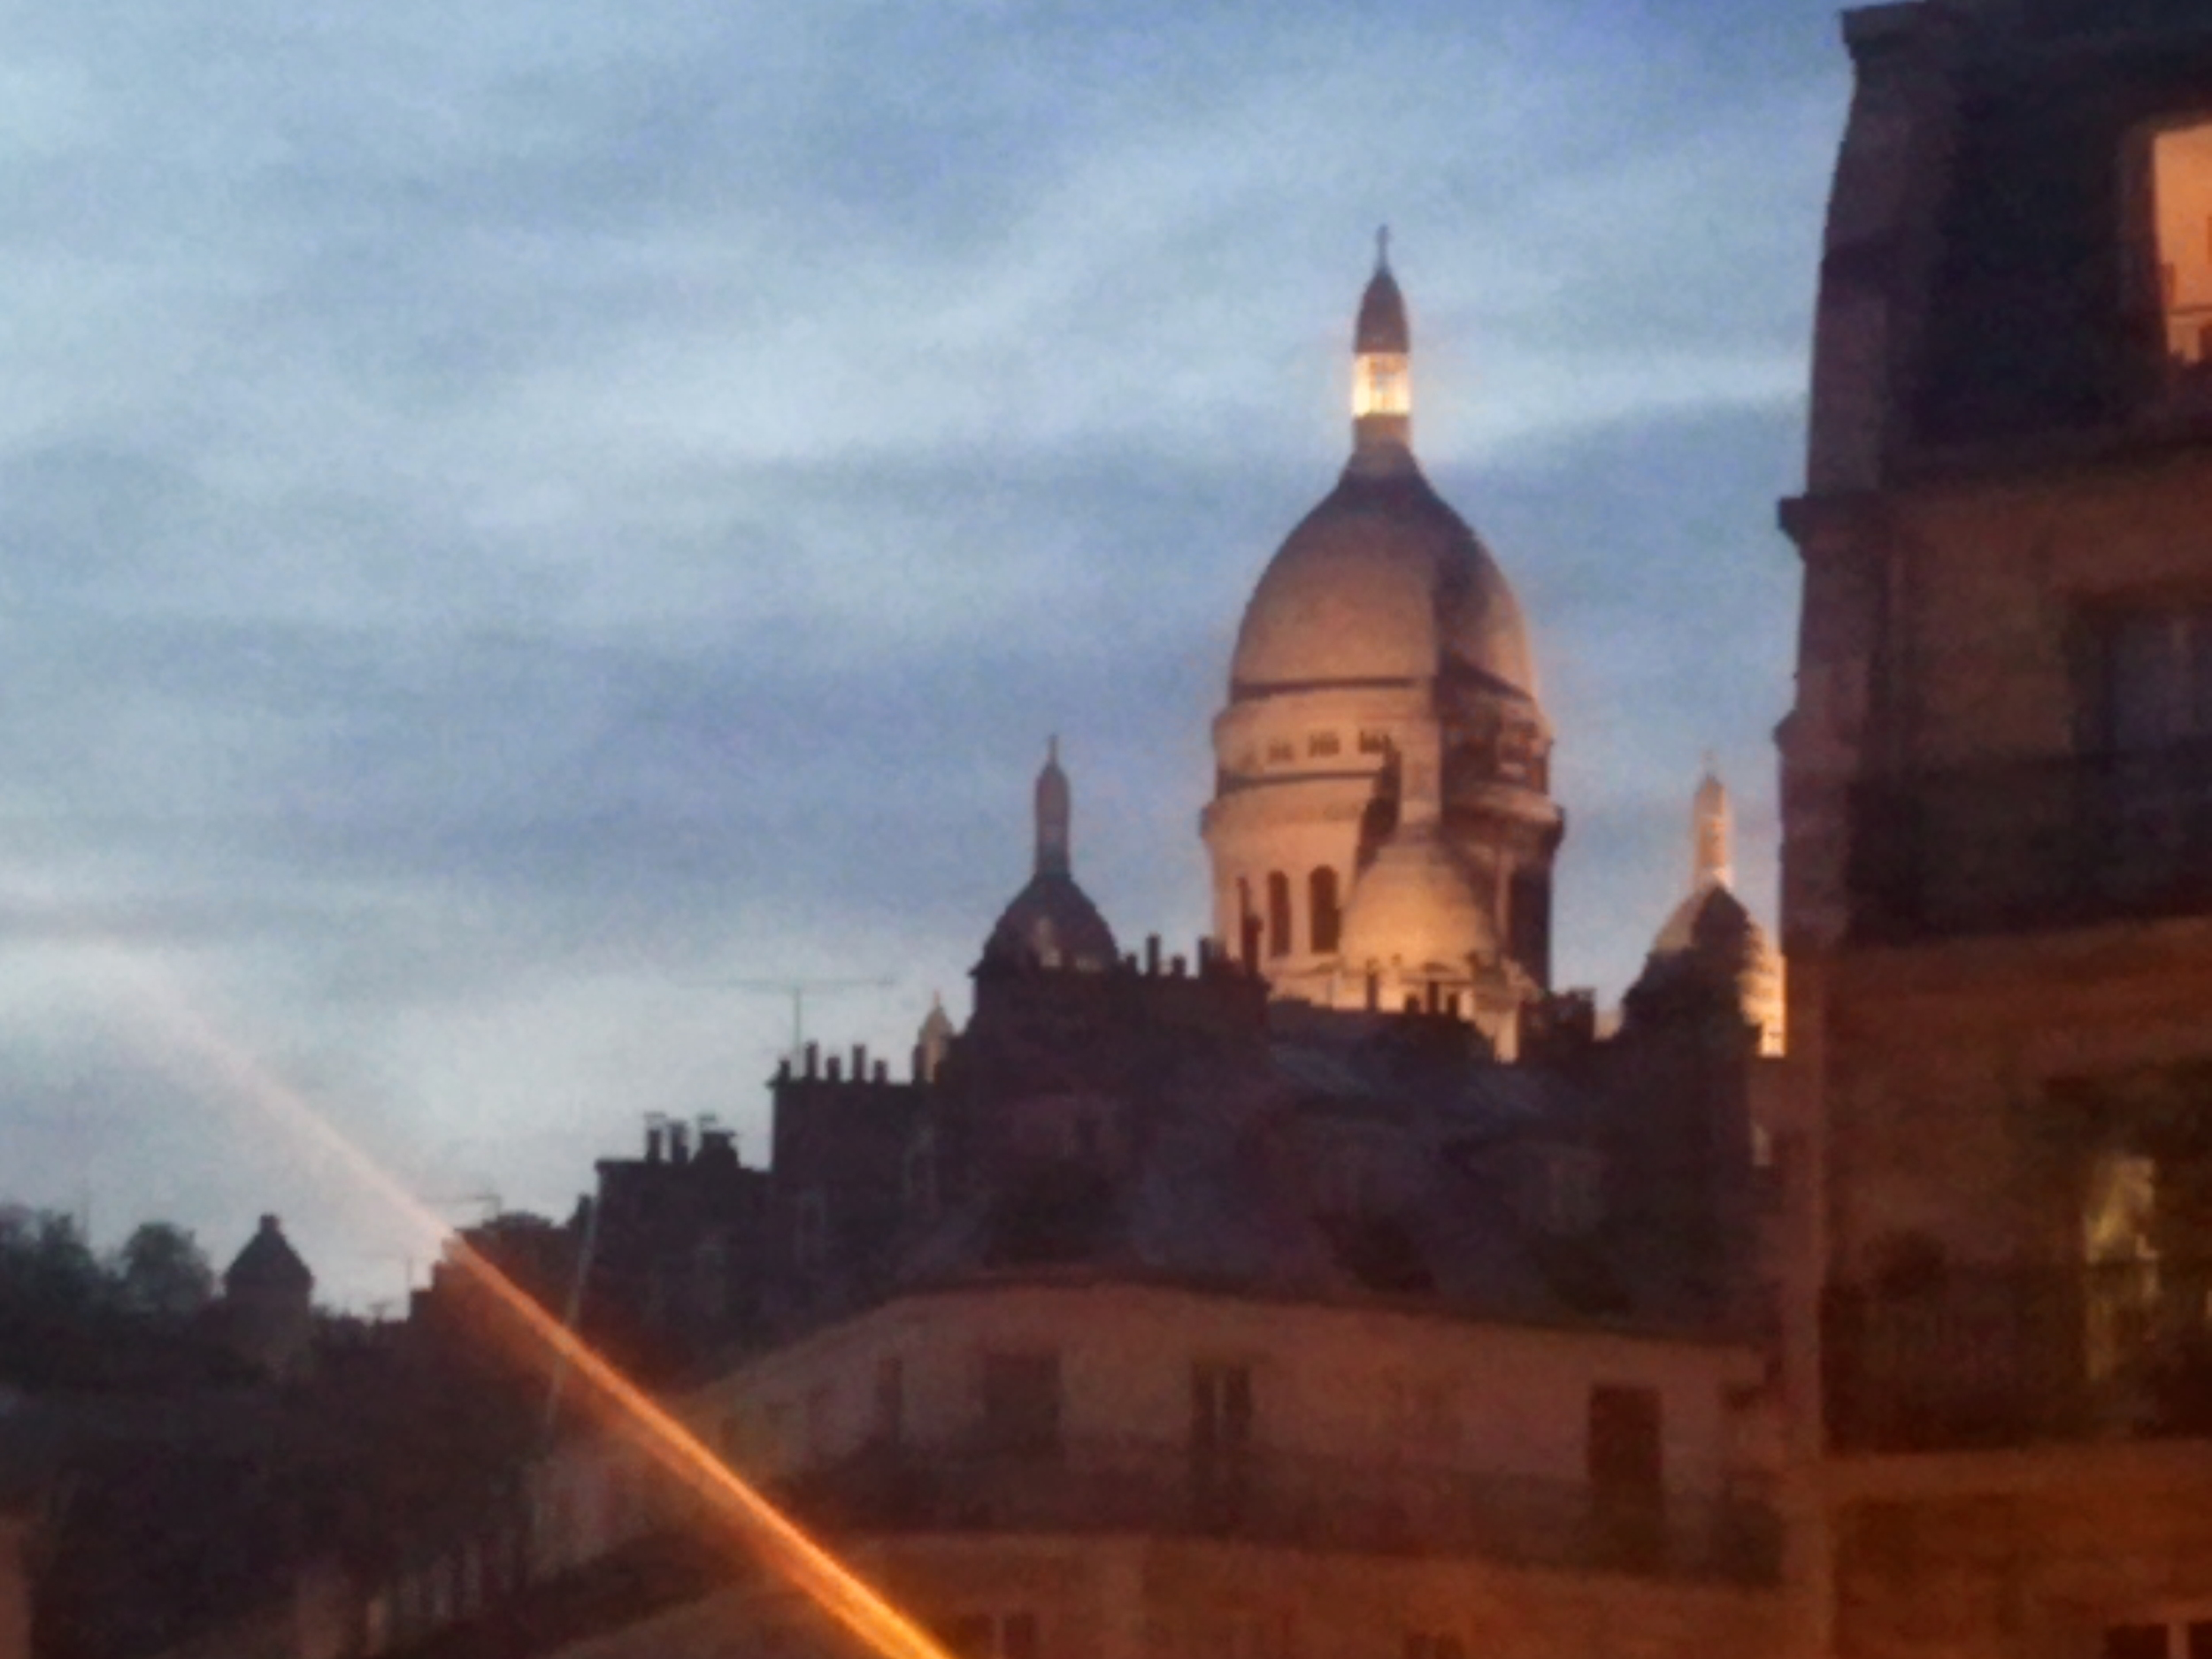 View of Sacre Coeur in Paris